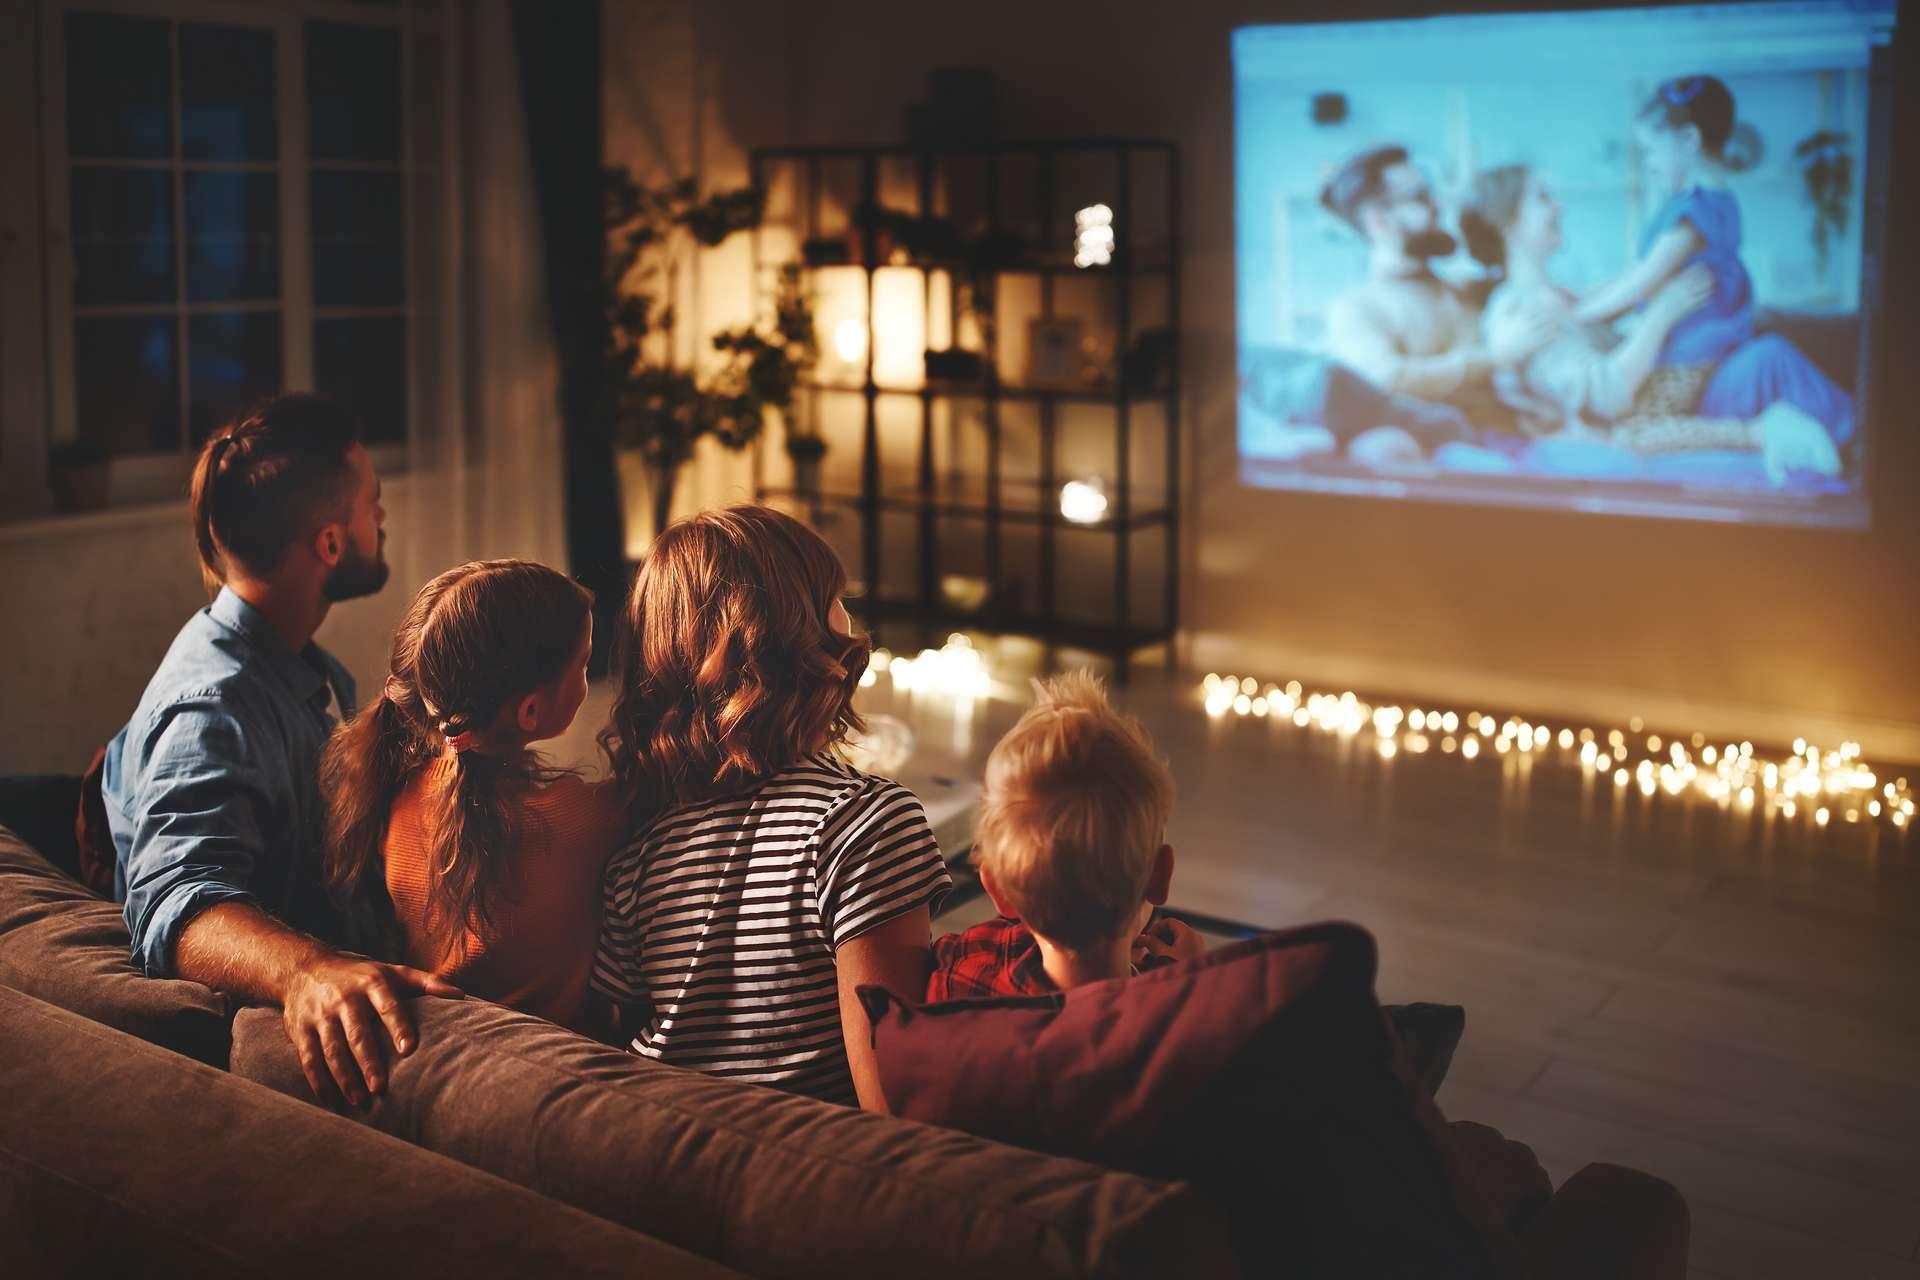 Bénéficiez d'un essai gratuit de 30 jours à la plateforme de streaming FilmoTV © JenkoAtaman, Adobe Stock